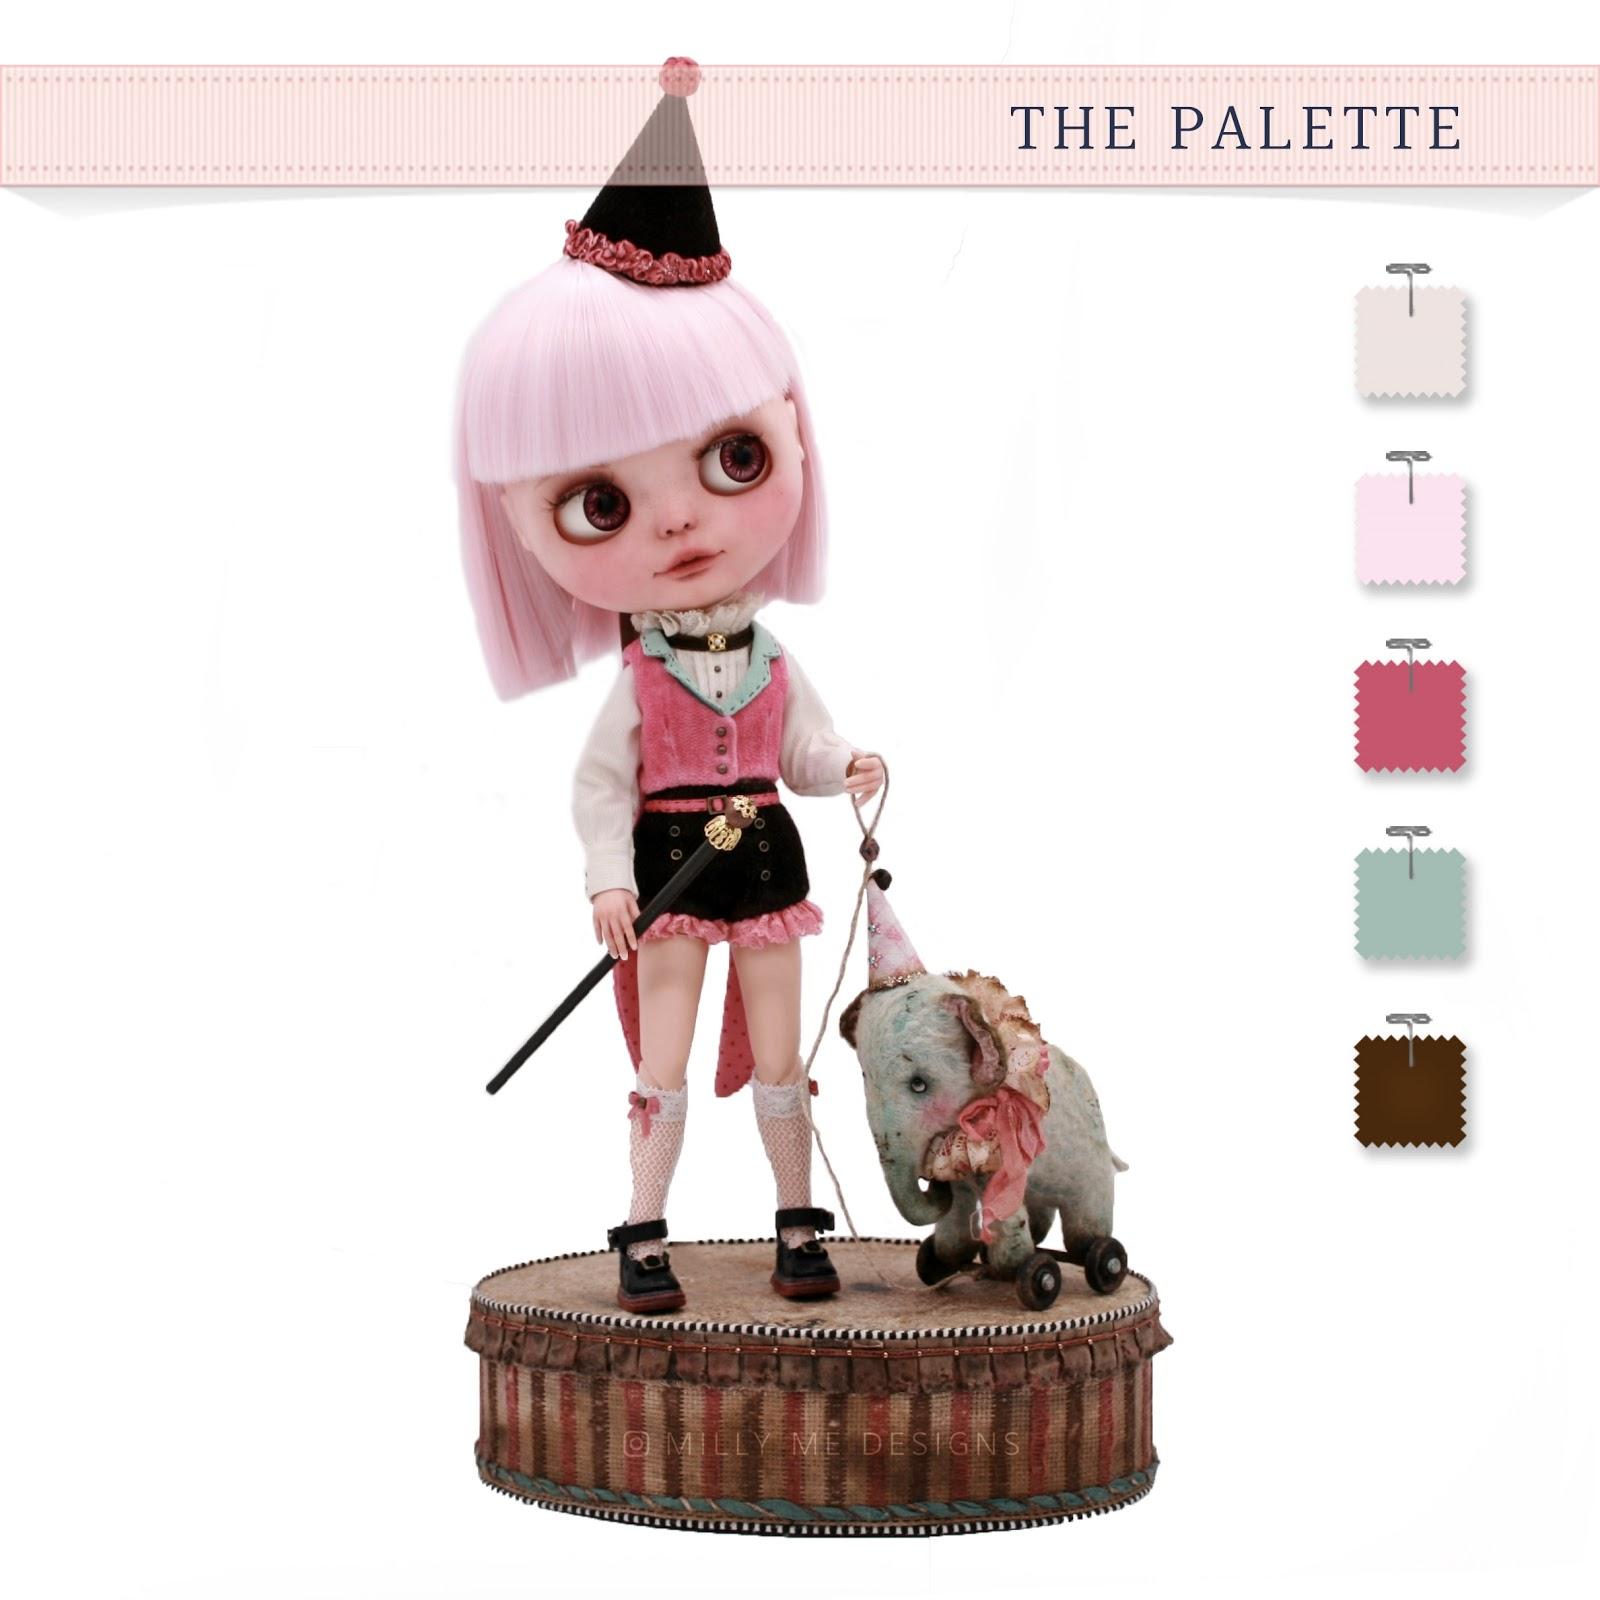 milly me designs, blythe, blythe outfit, blythe dress, blythe doll, blythe custom, custom blythe, blythe clothes